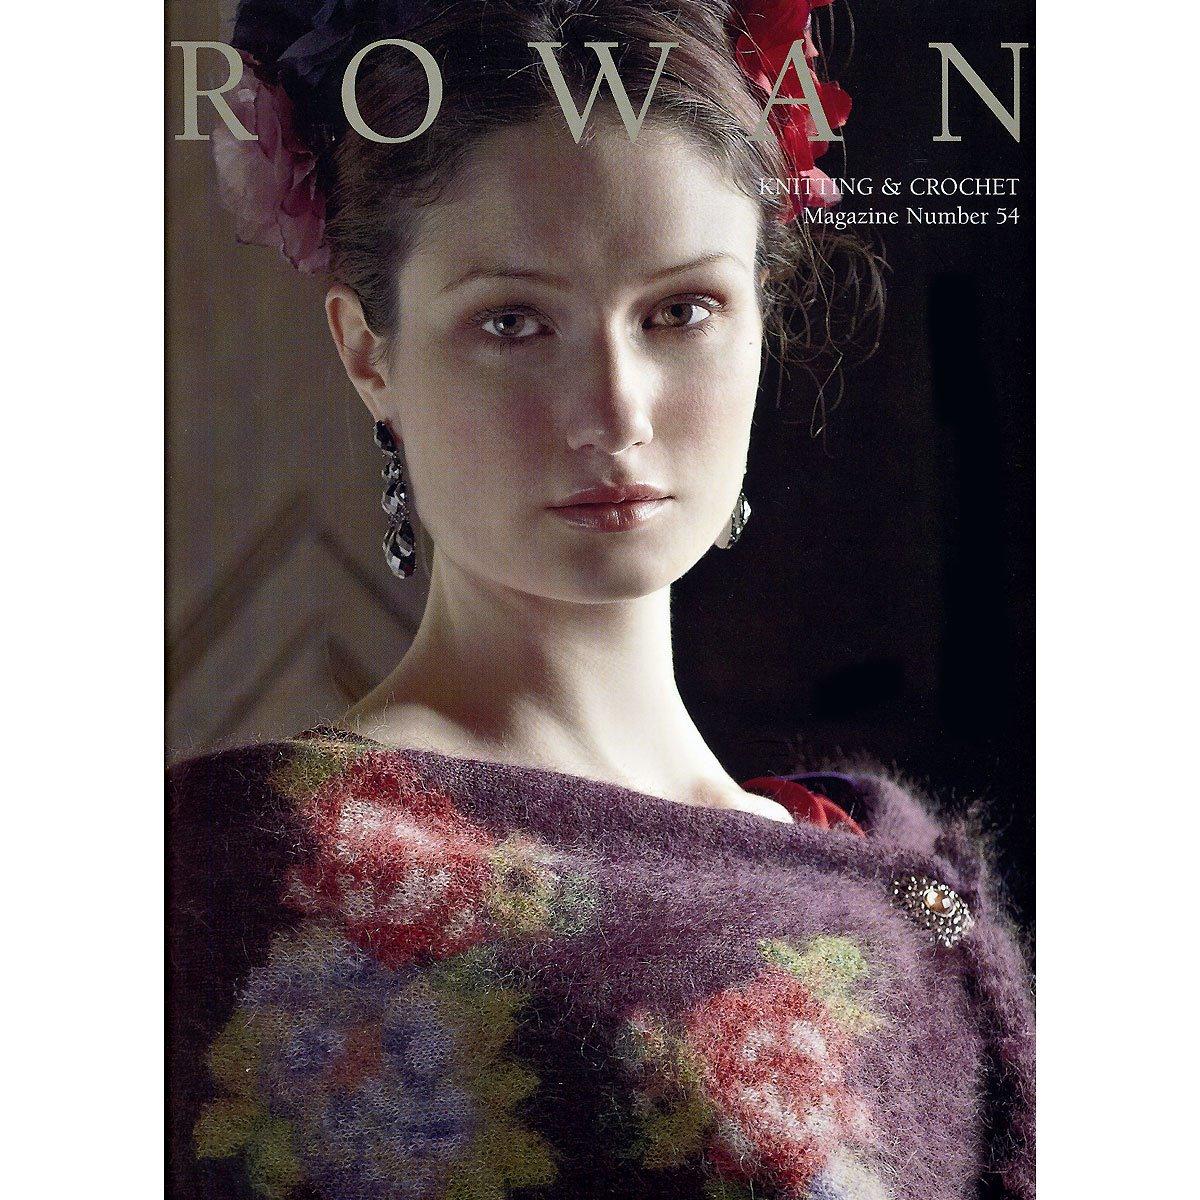 Rowan Knitting & Crochet Magazine 54 FW13